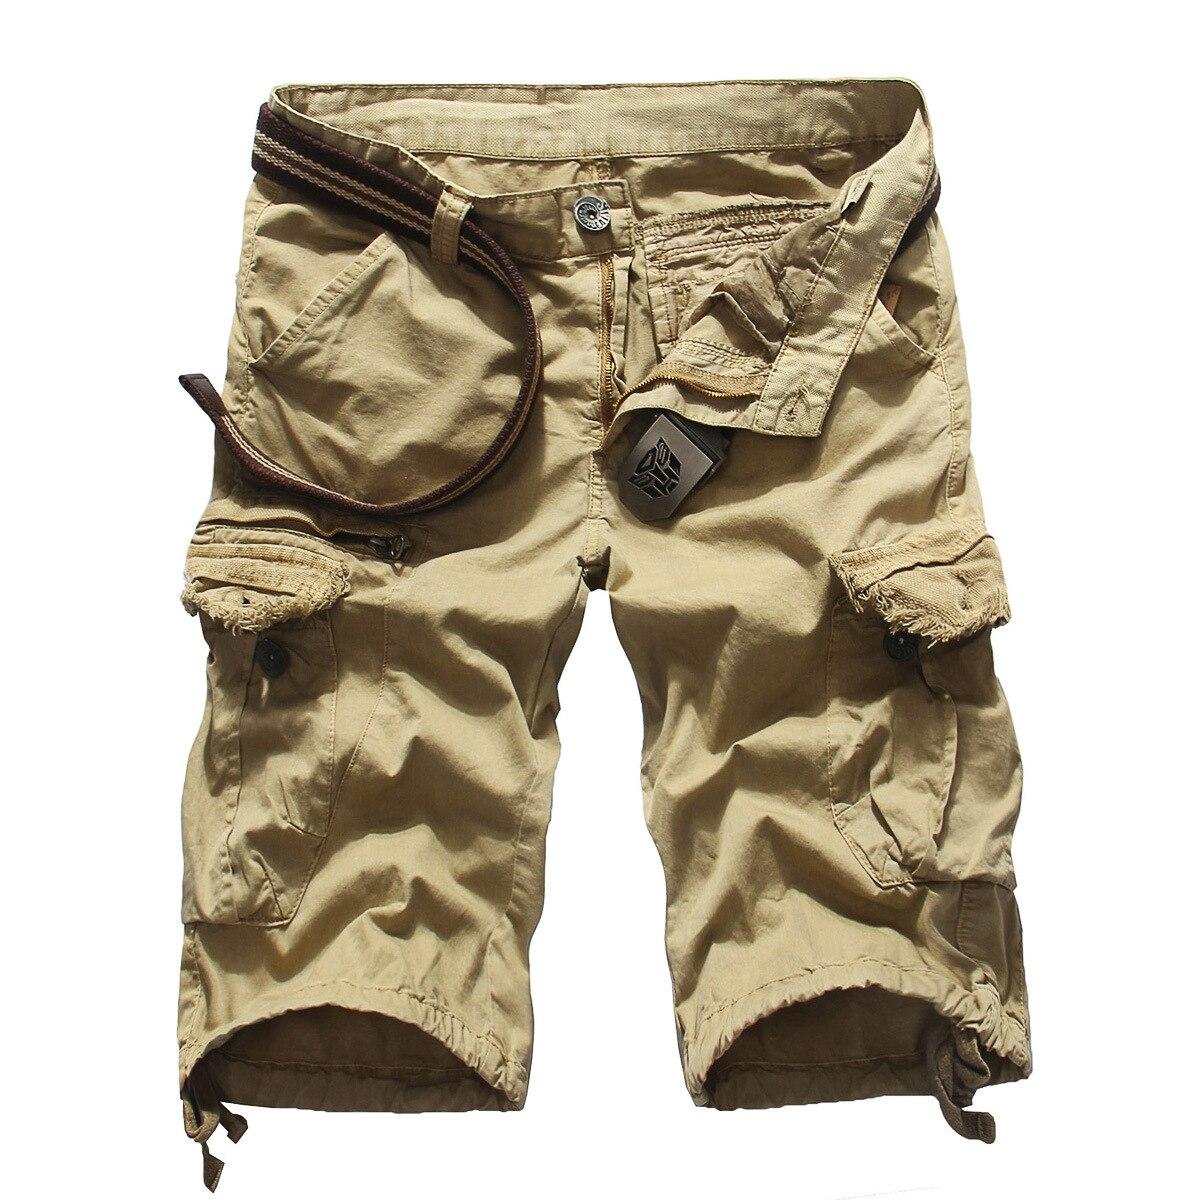 Cargo Shorts Men New Arrival Fashion Men Cargo Shorts Straight Loose Fashion Cotton Mans Short Casual Trousers Bottoms Plus Size